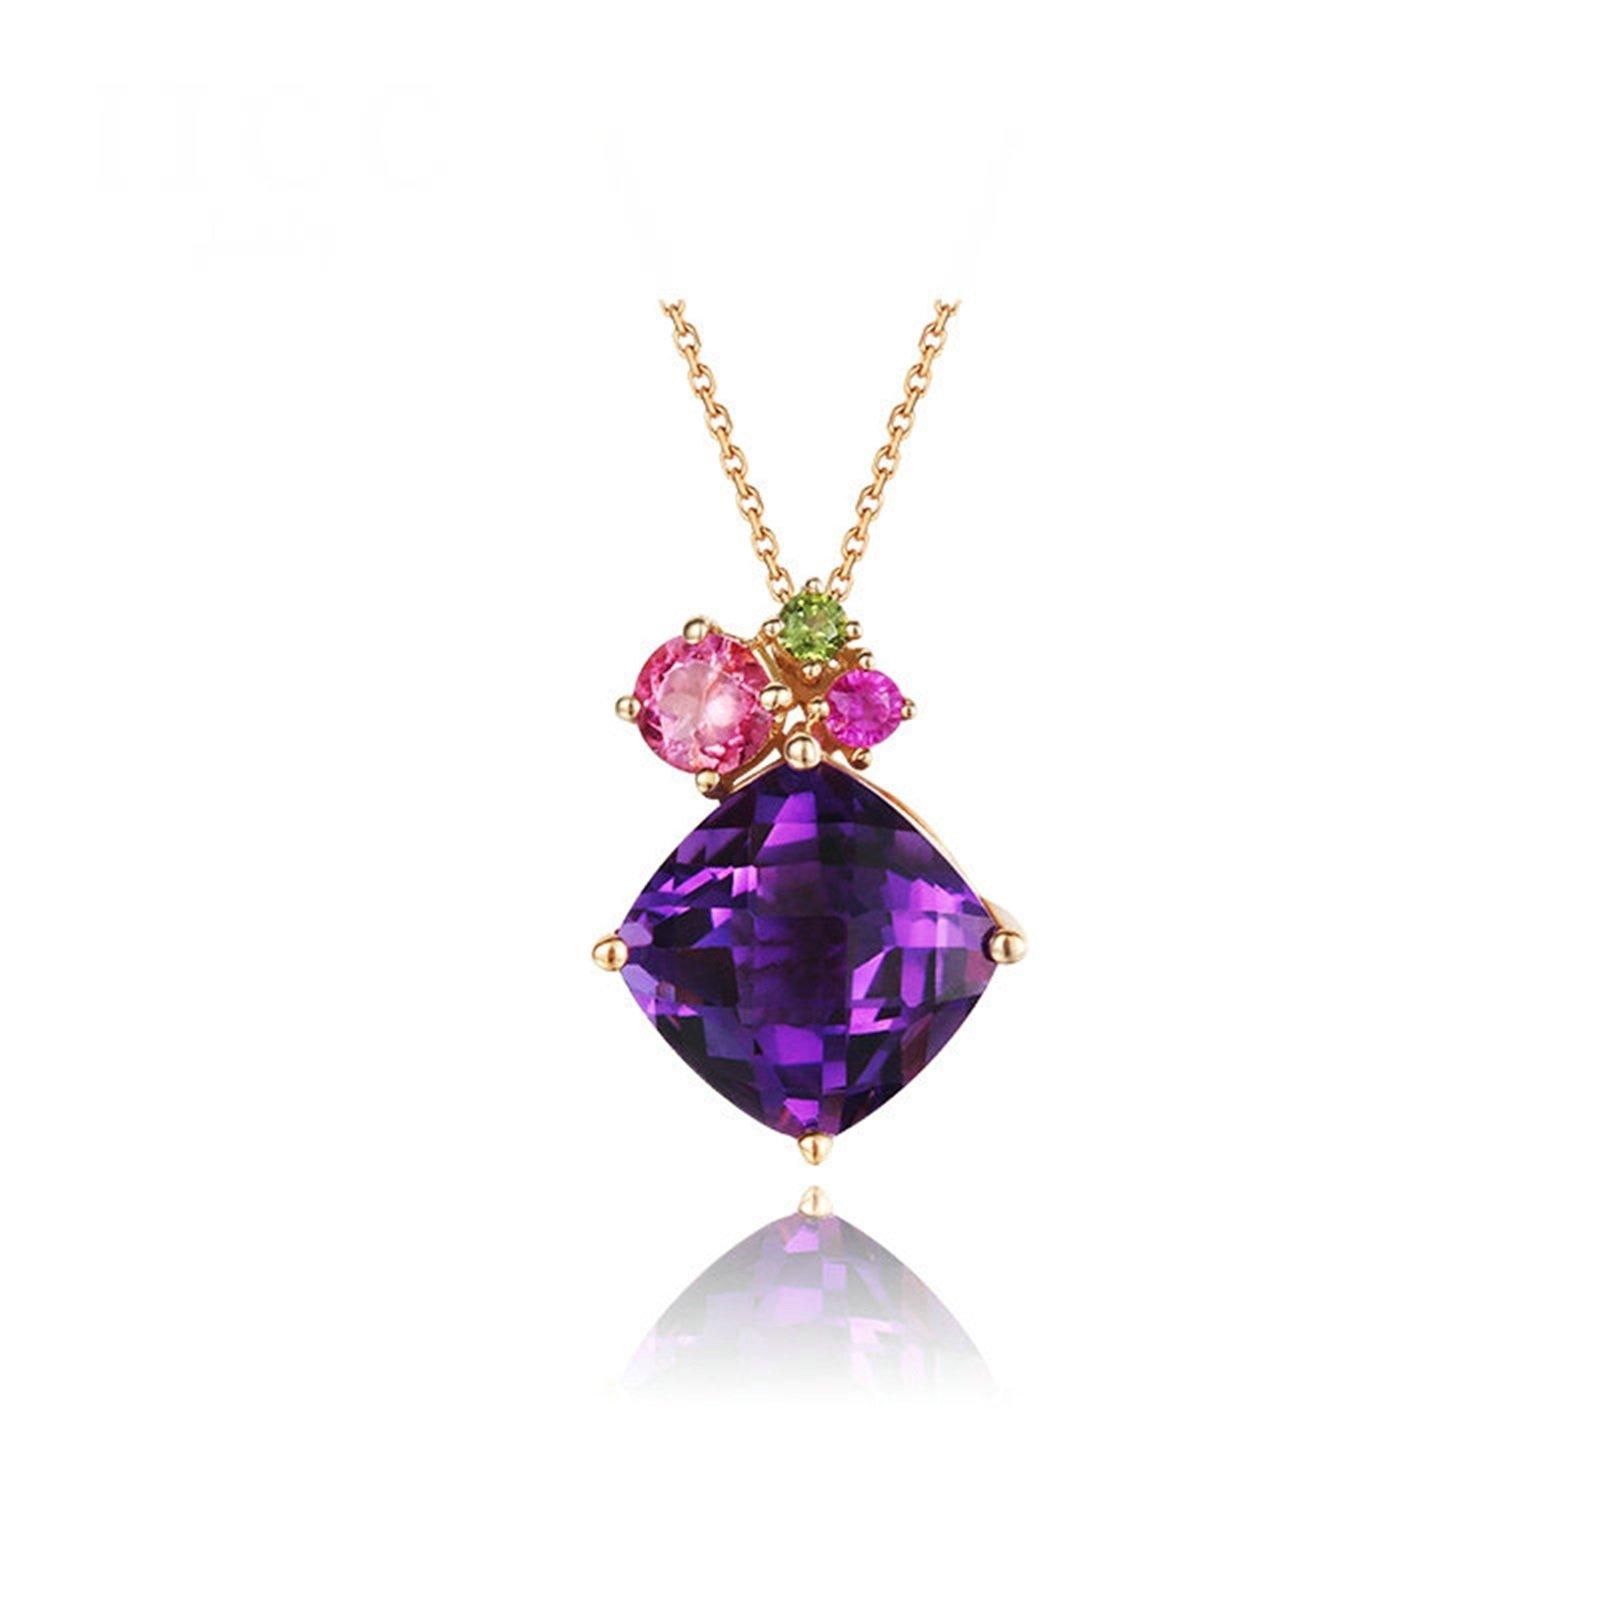 KnSam 18K Gold Necklace For Women Purple Sapphire Radiant Cut Rose Gold 40CM,0.75Ct [Fine Jewelry]